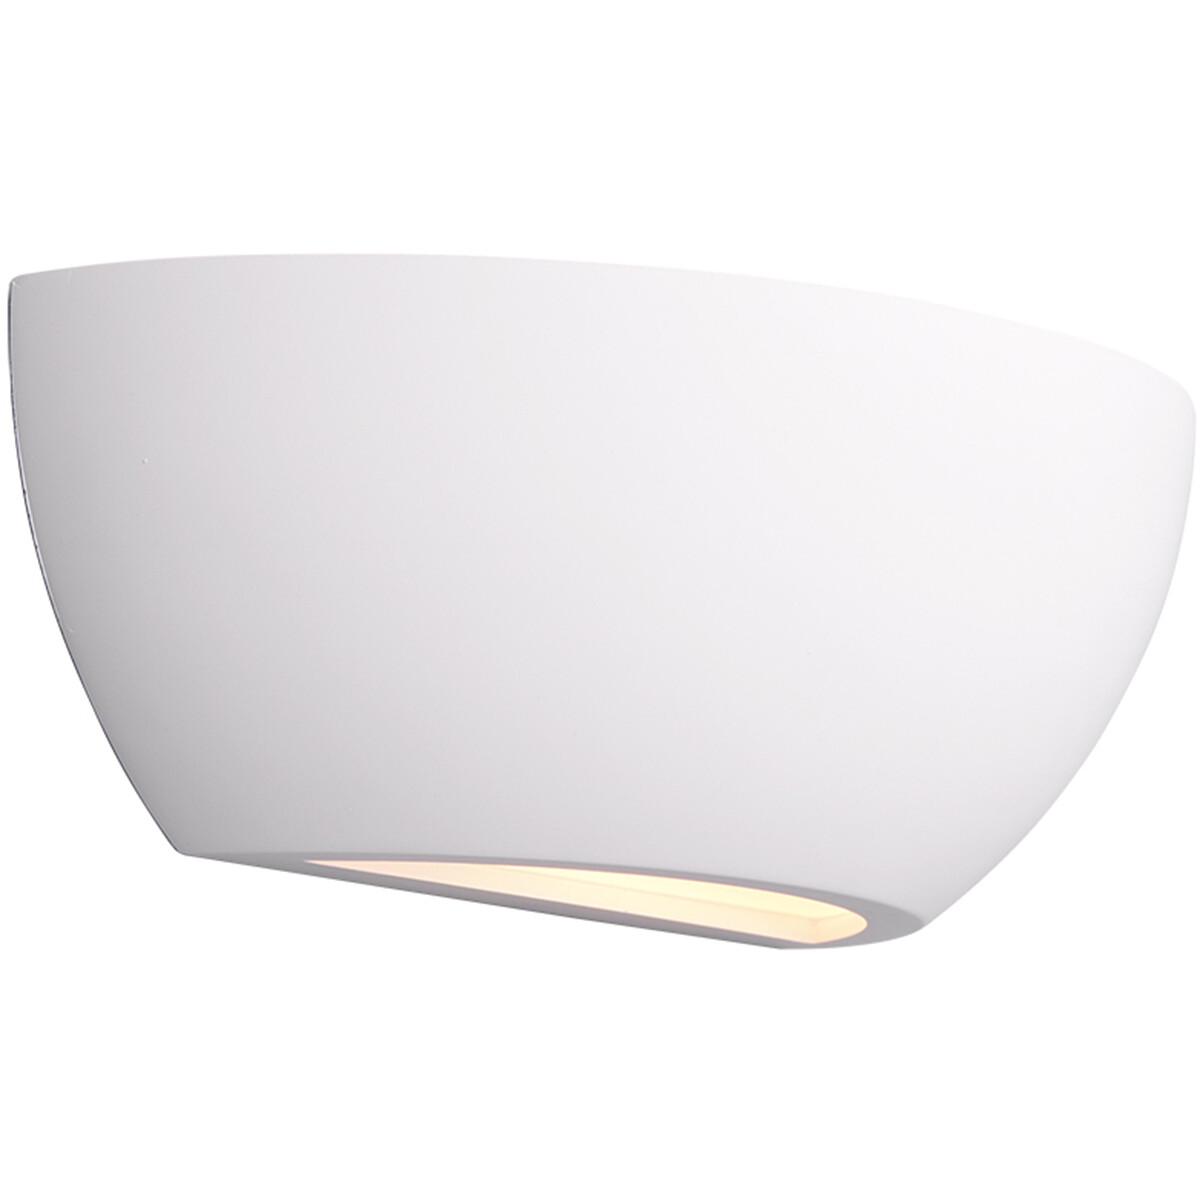 LED Wandlamp - Wandverlichting - Trion Roman - E14 Fitting - Rechthoek - Mat Wit - Gips